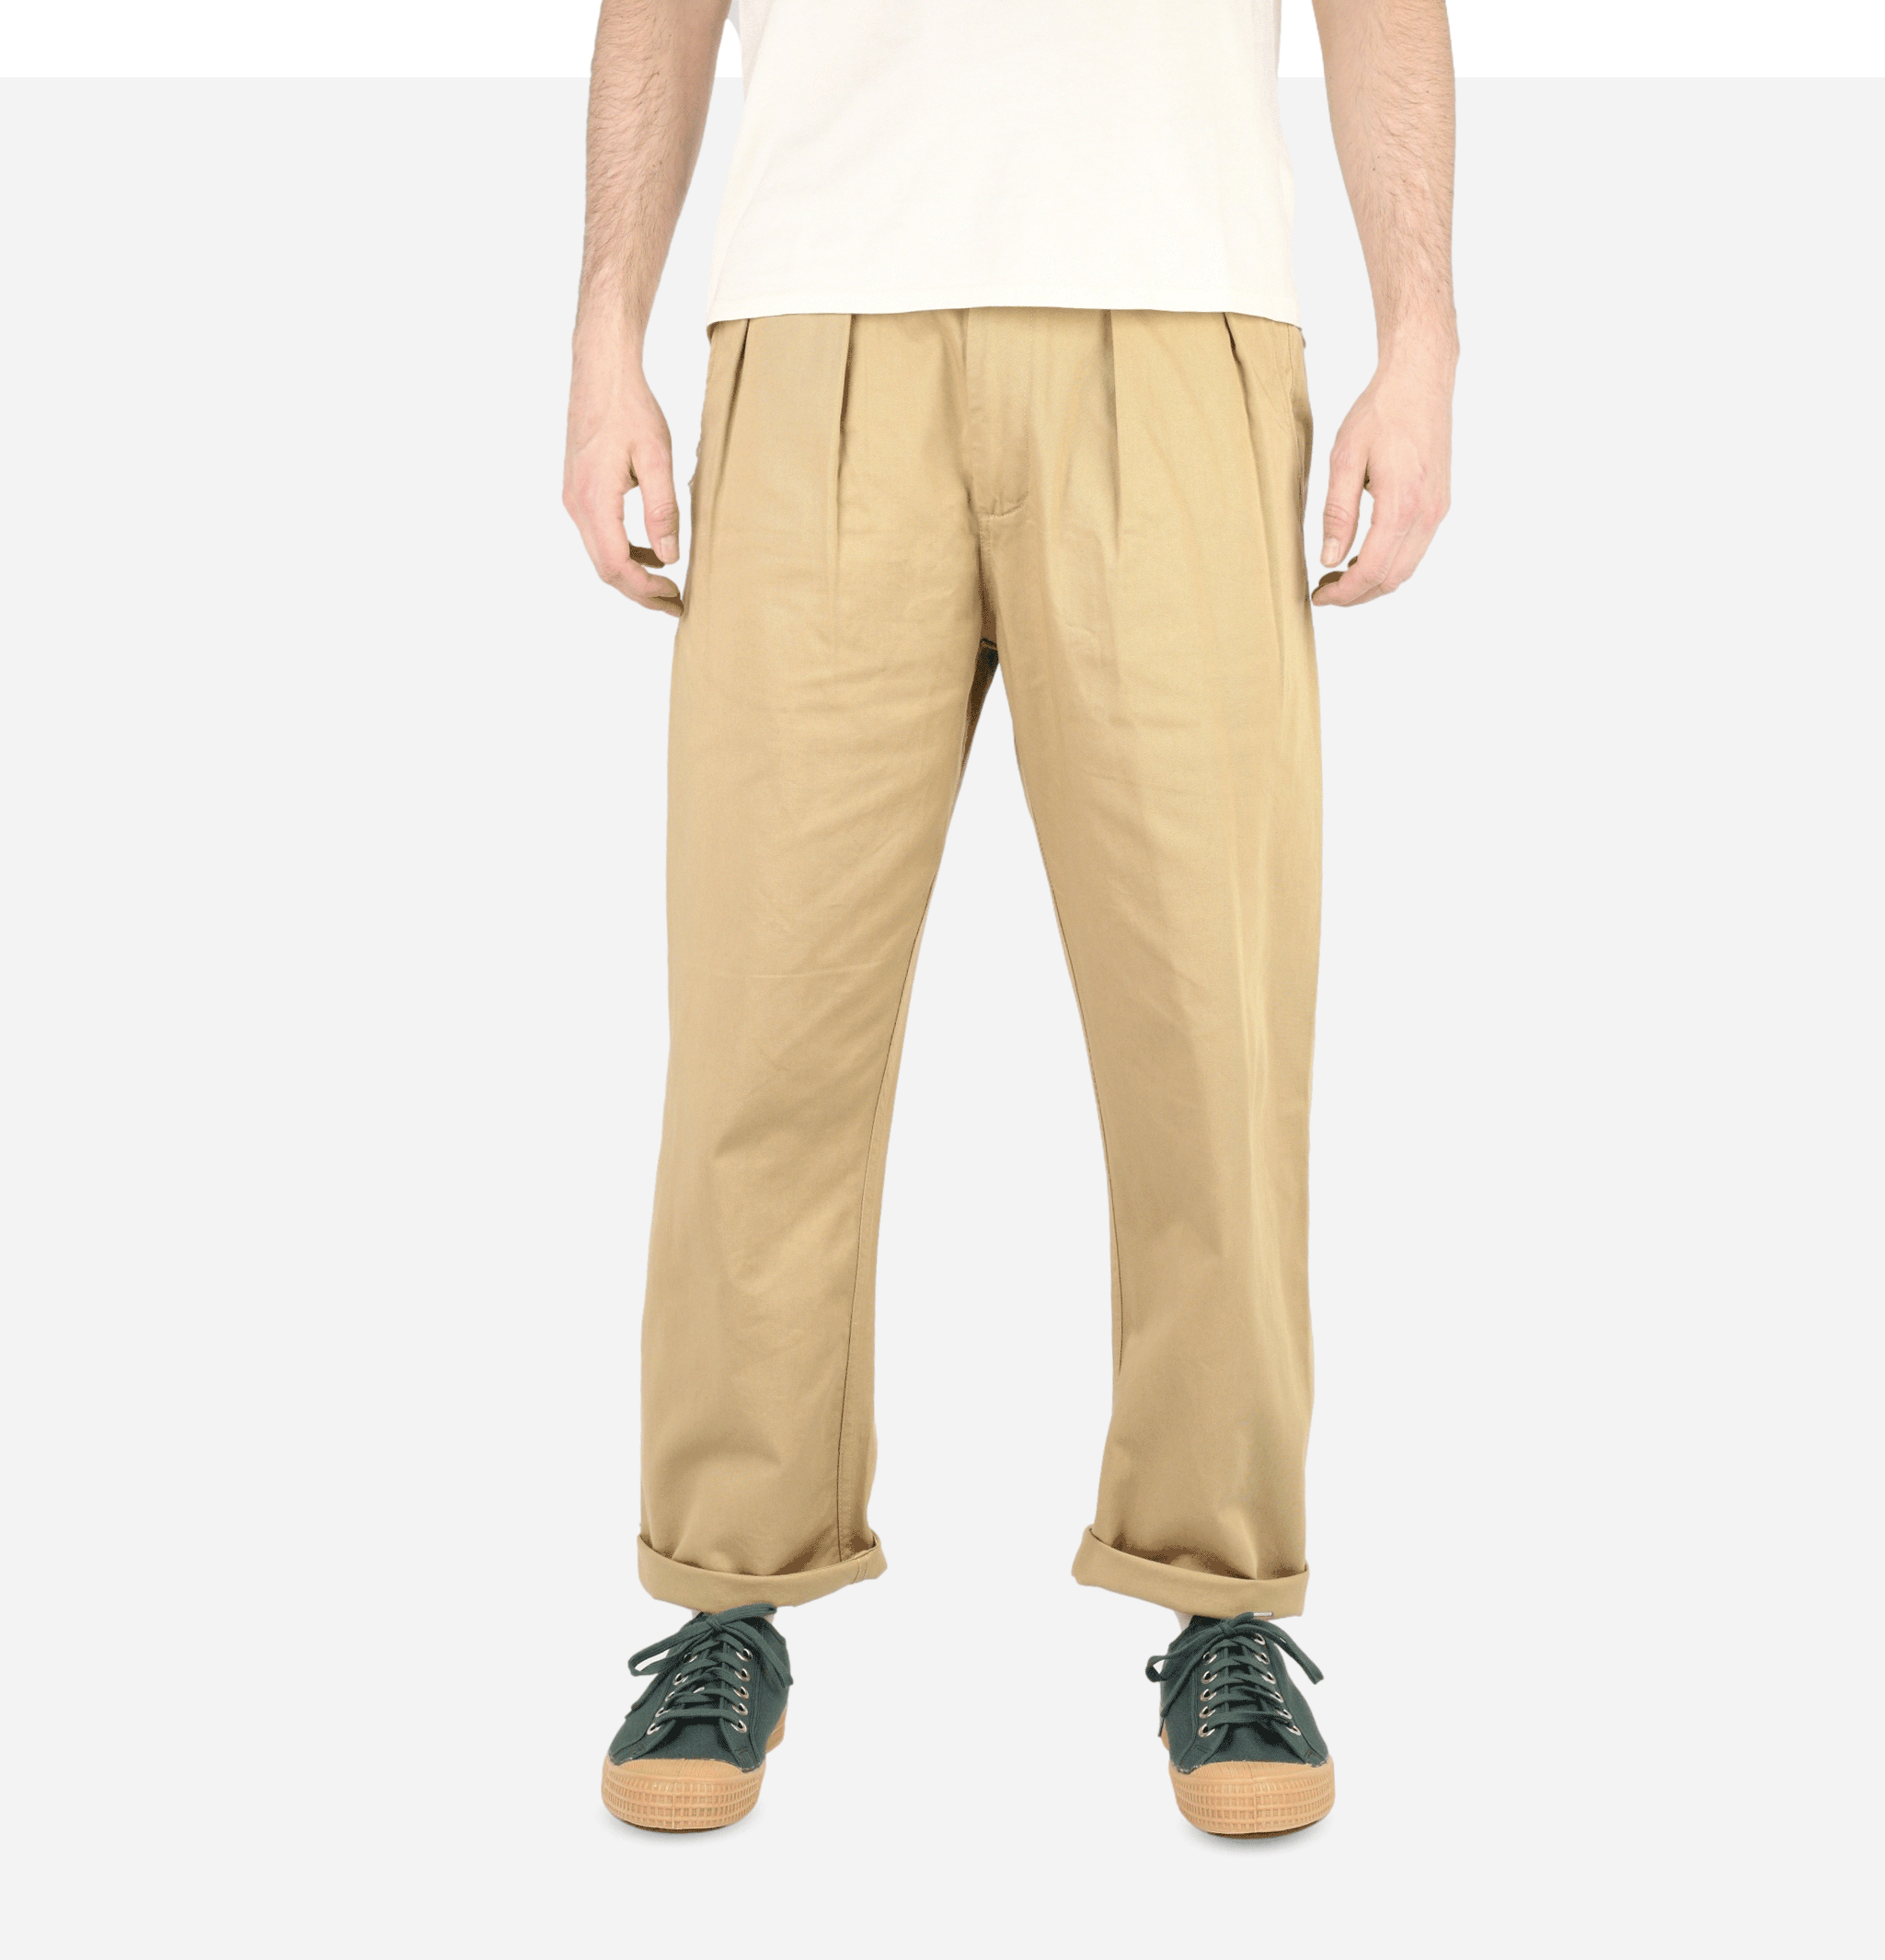 Double Pleat Pant Tan